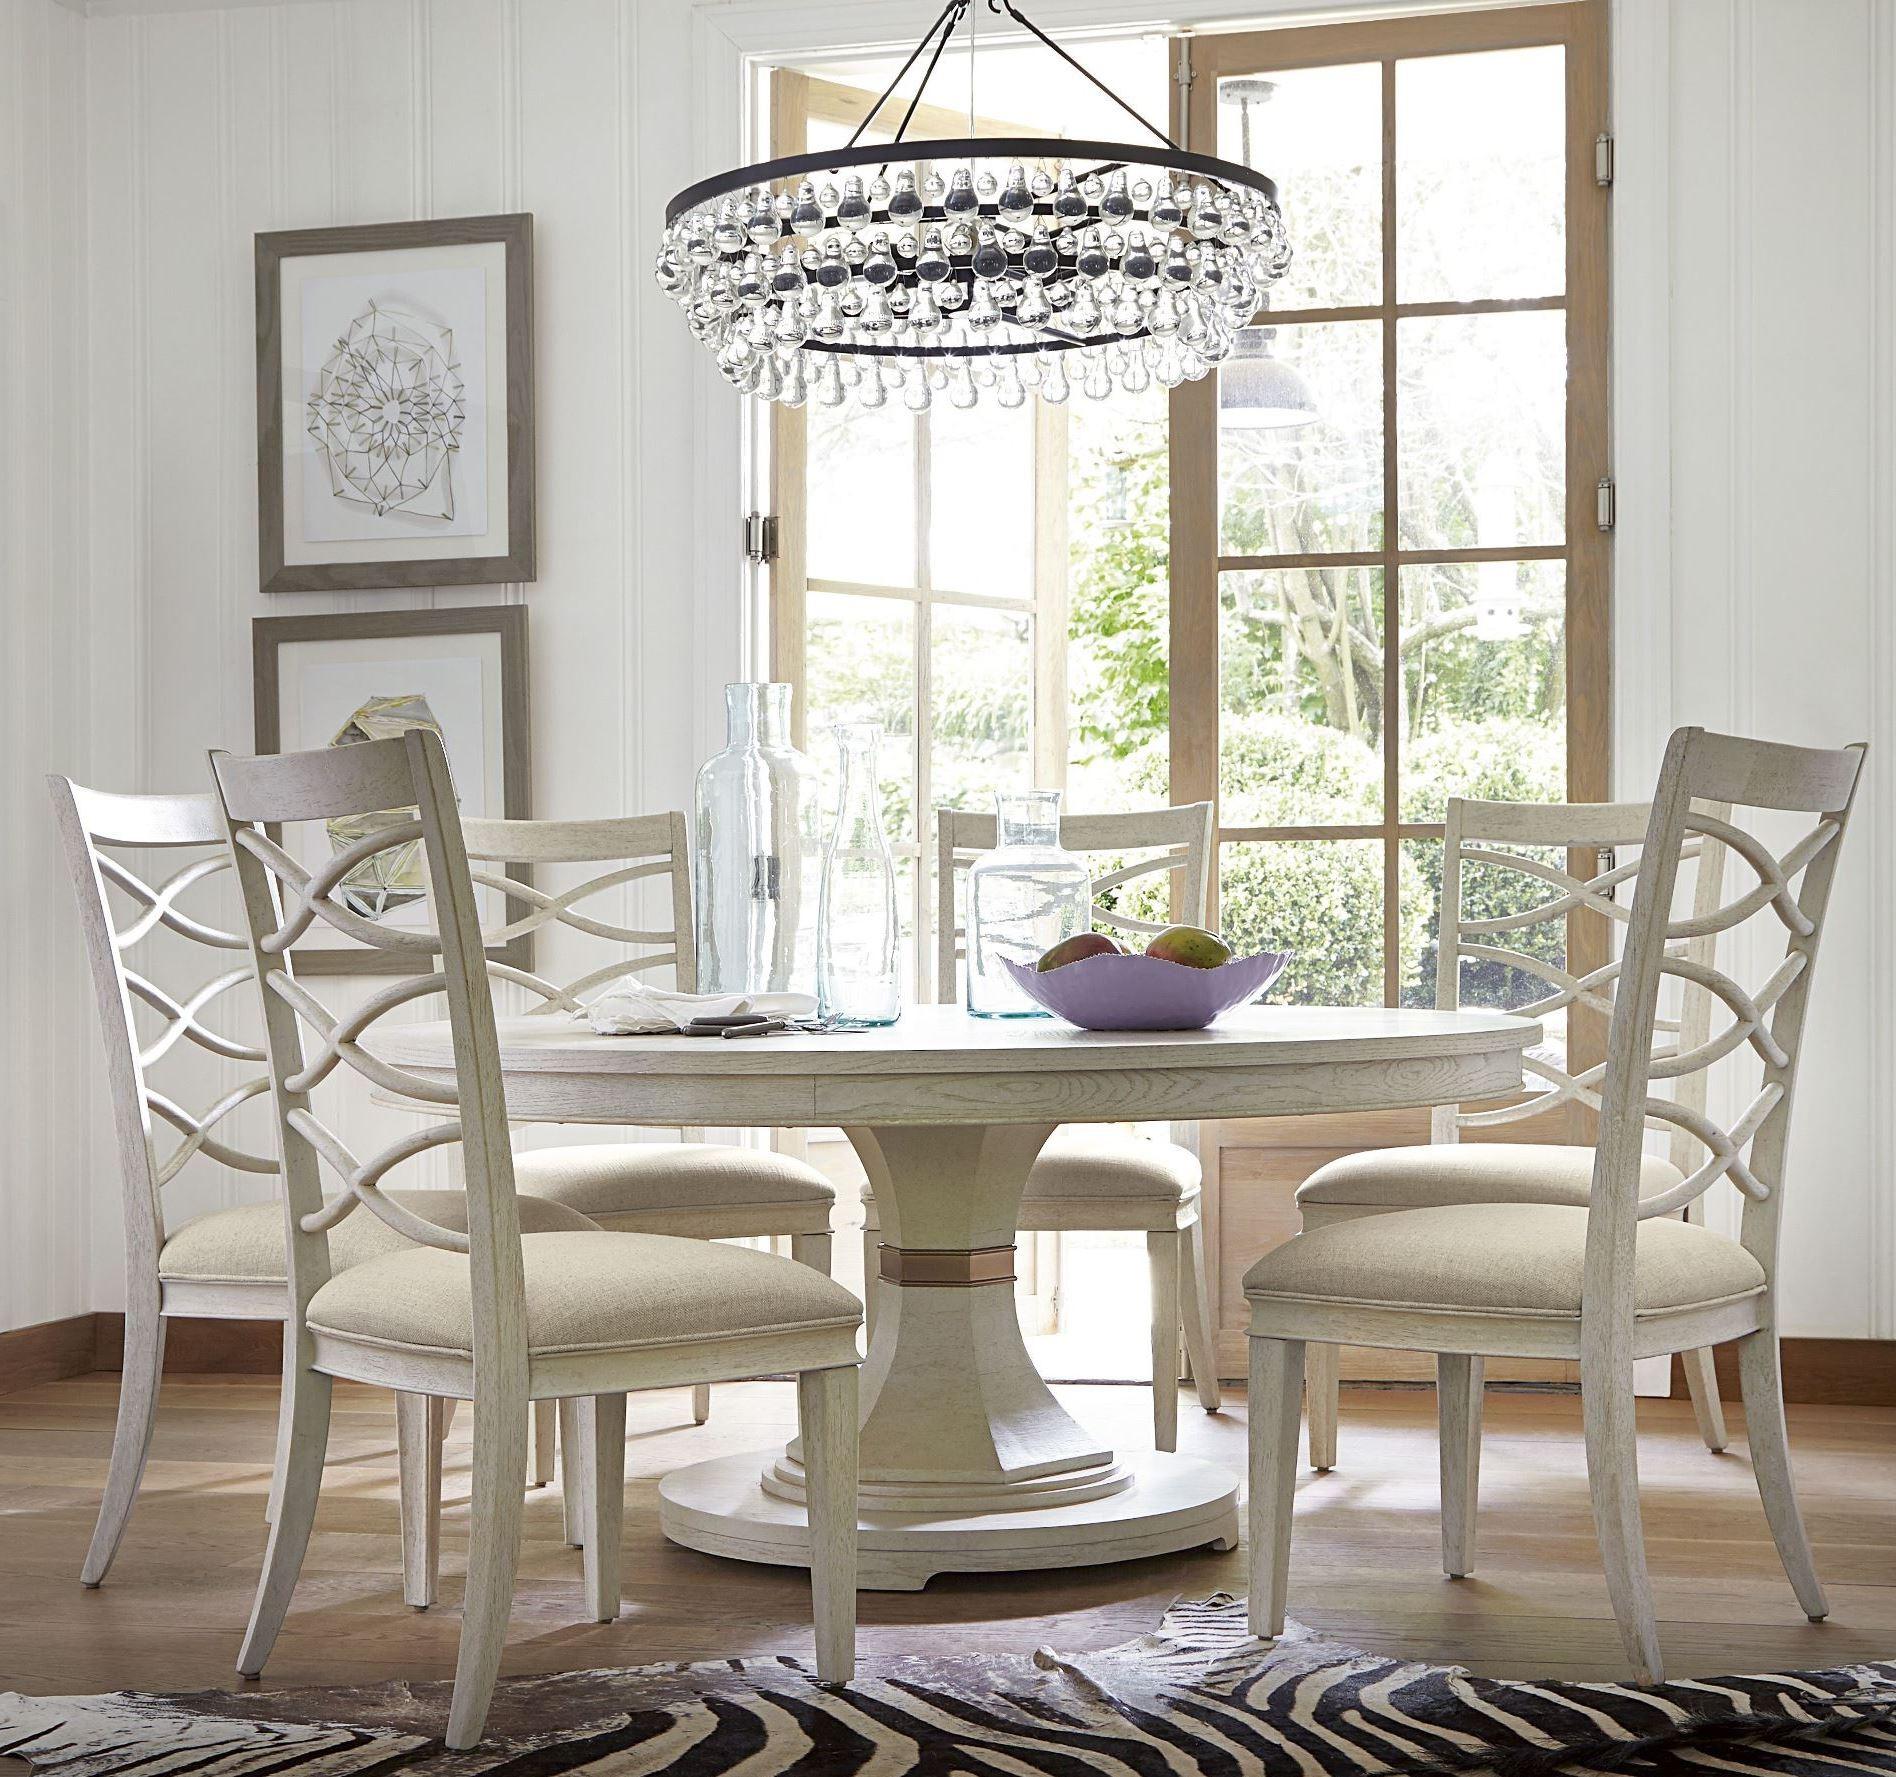 Dining room furniture gt dining sets gt california malibu round dining